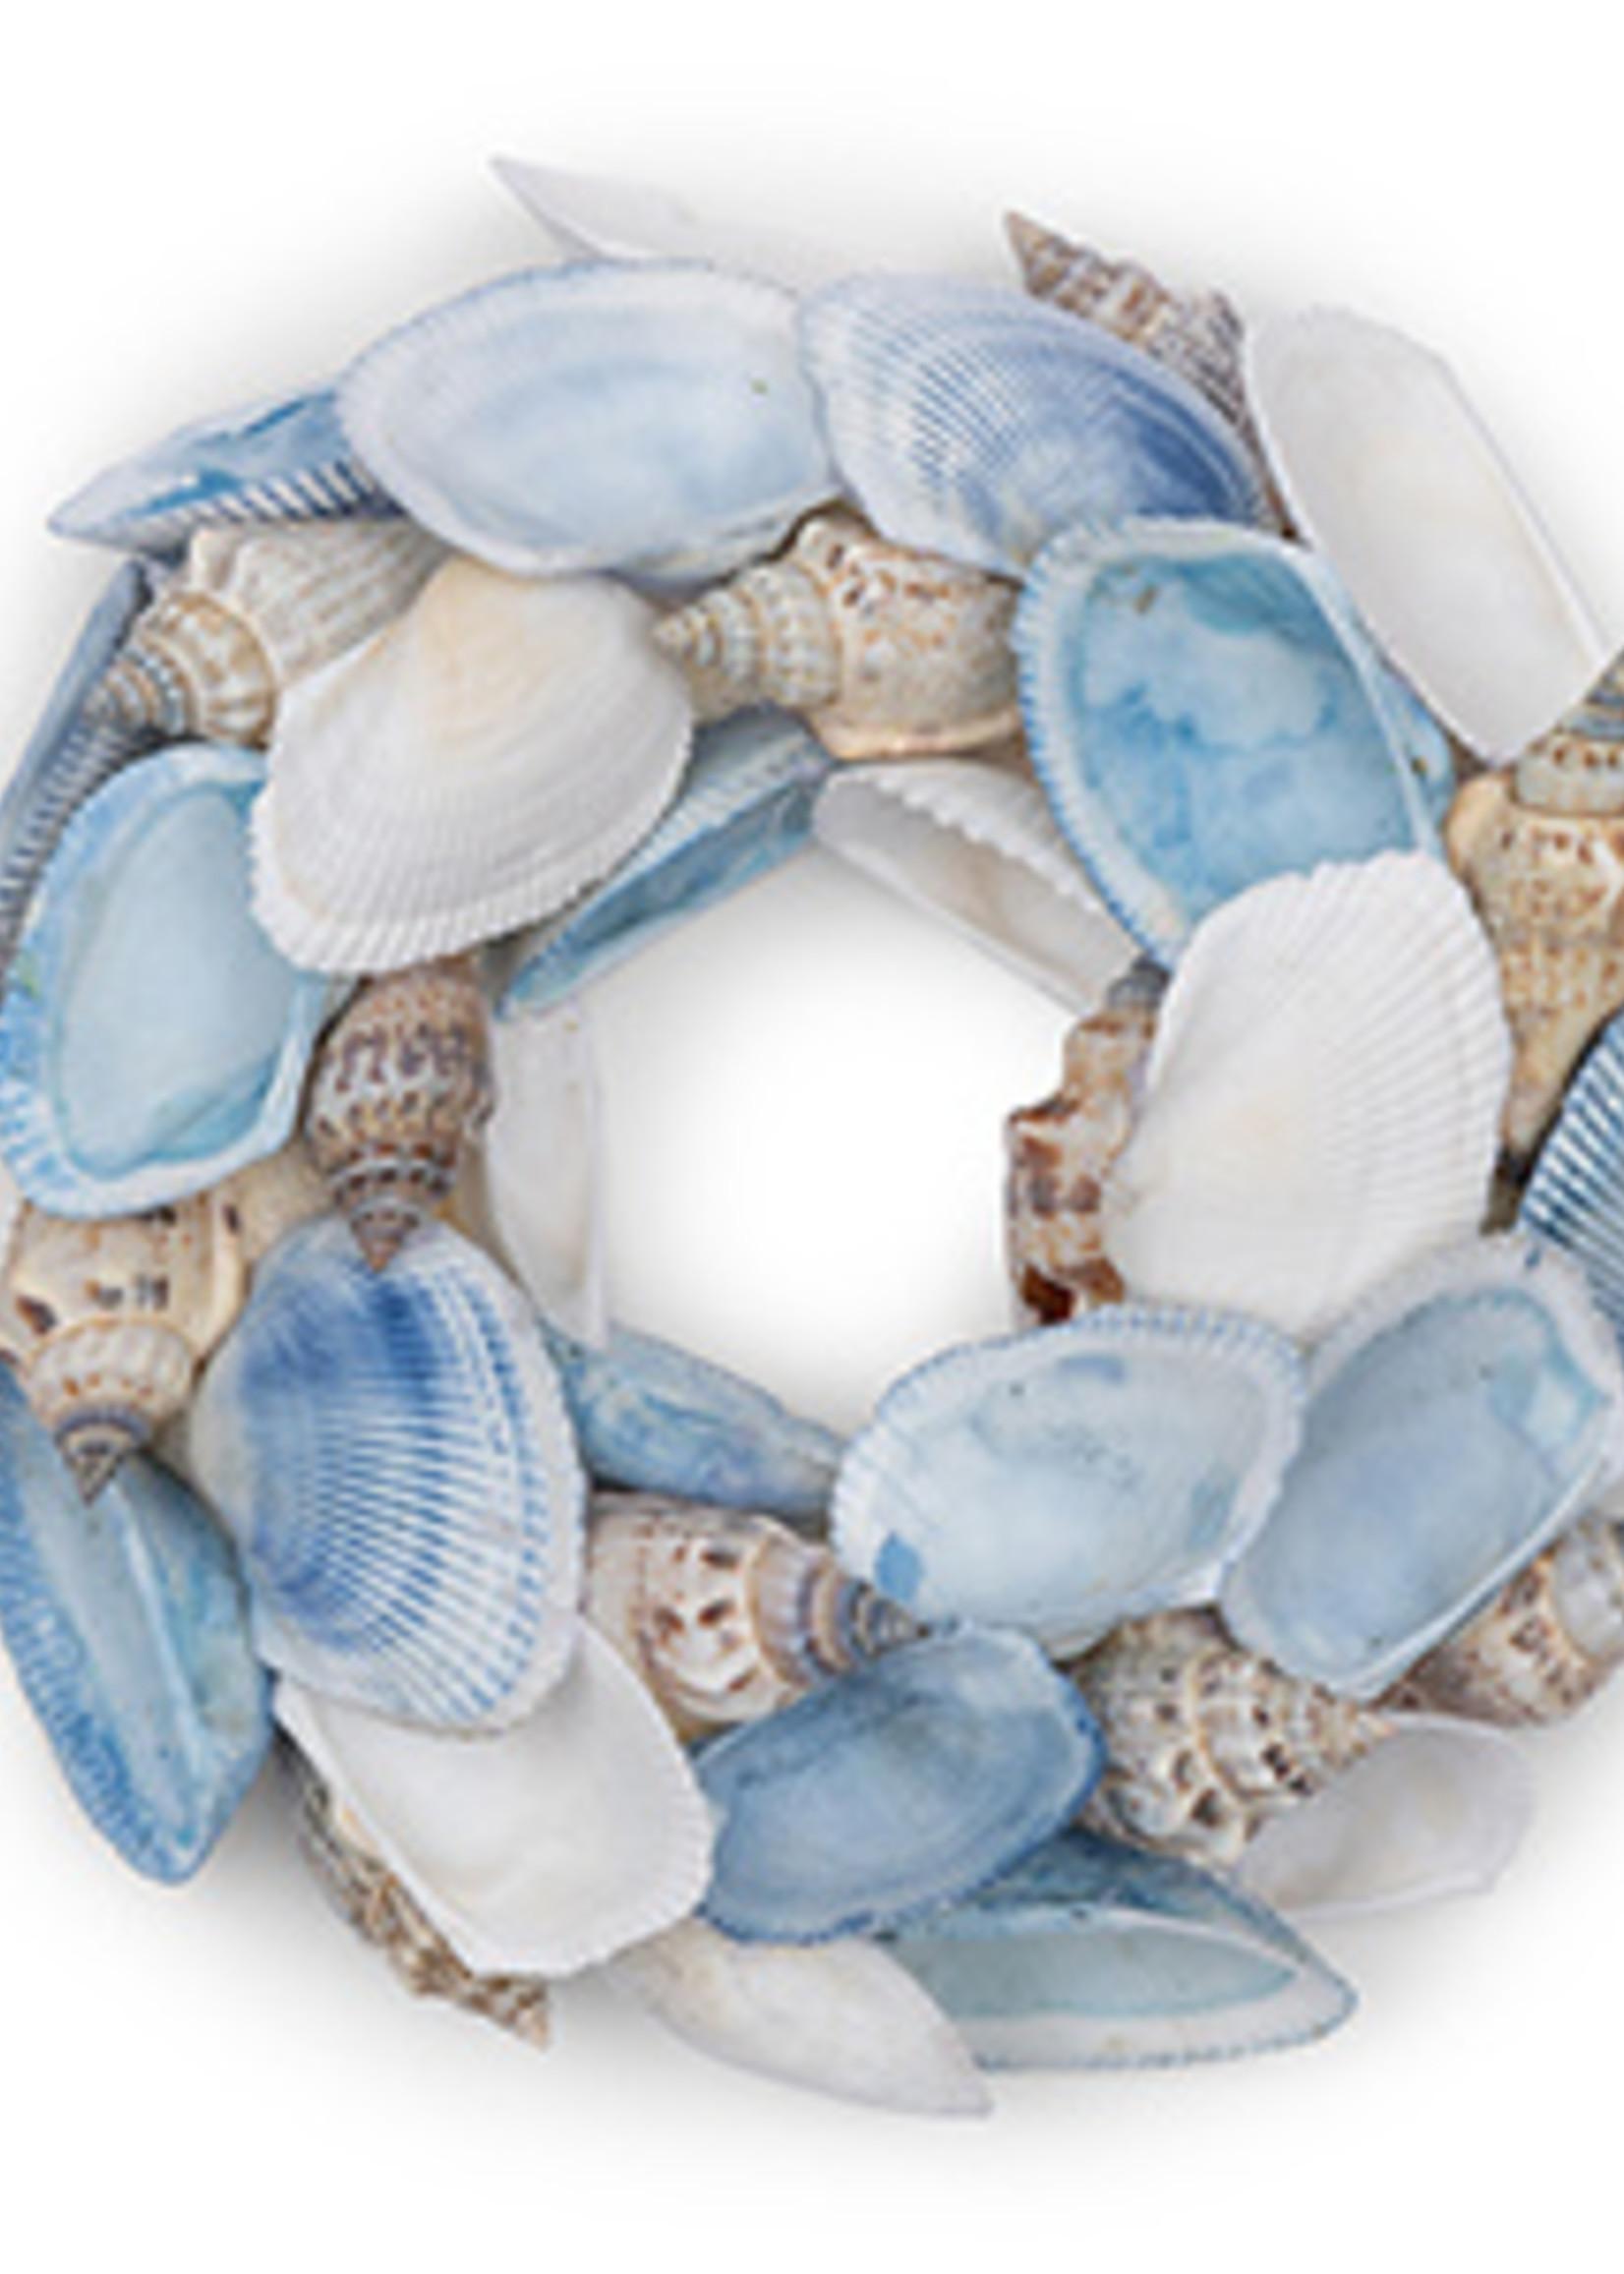 Riviera Maison Blue Sea Shell Wreath Dia 15